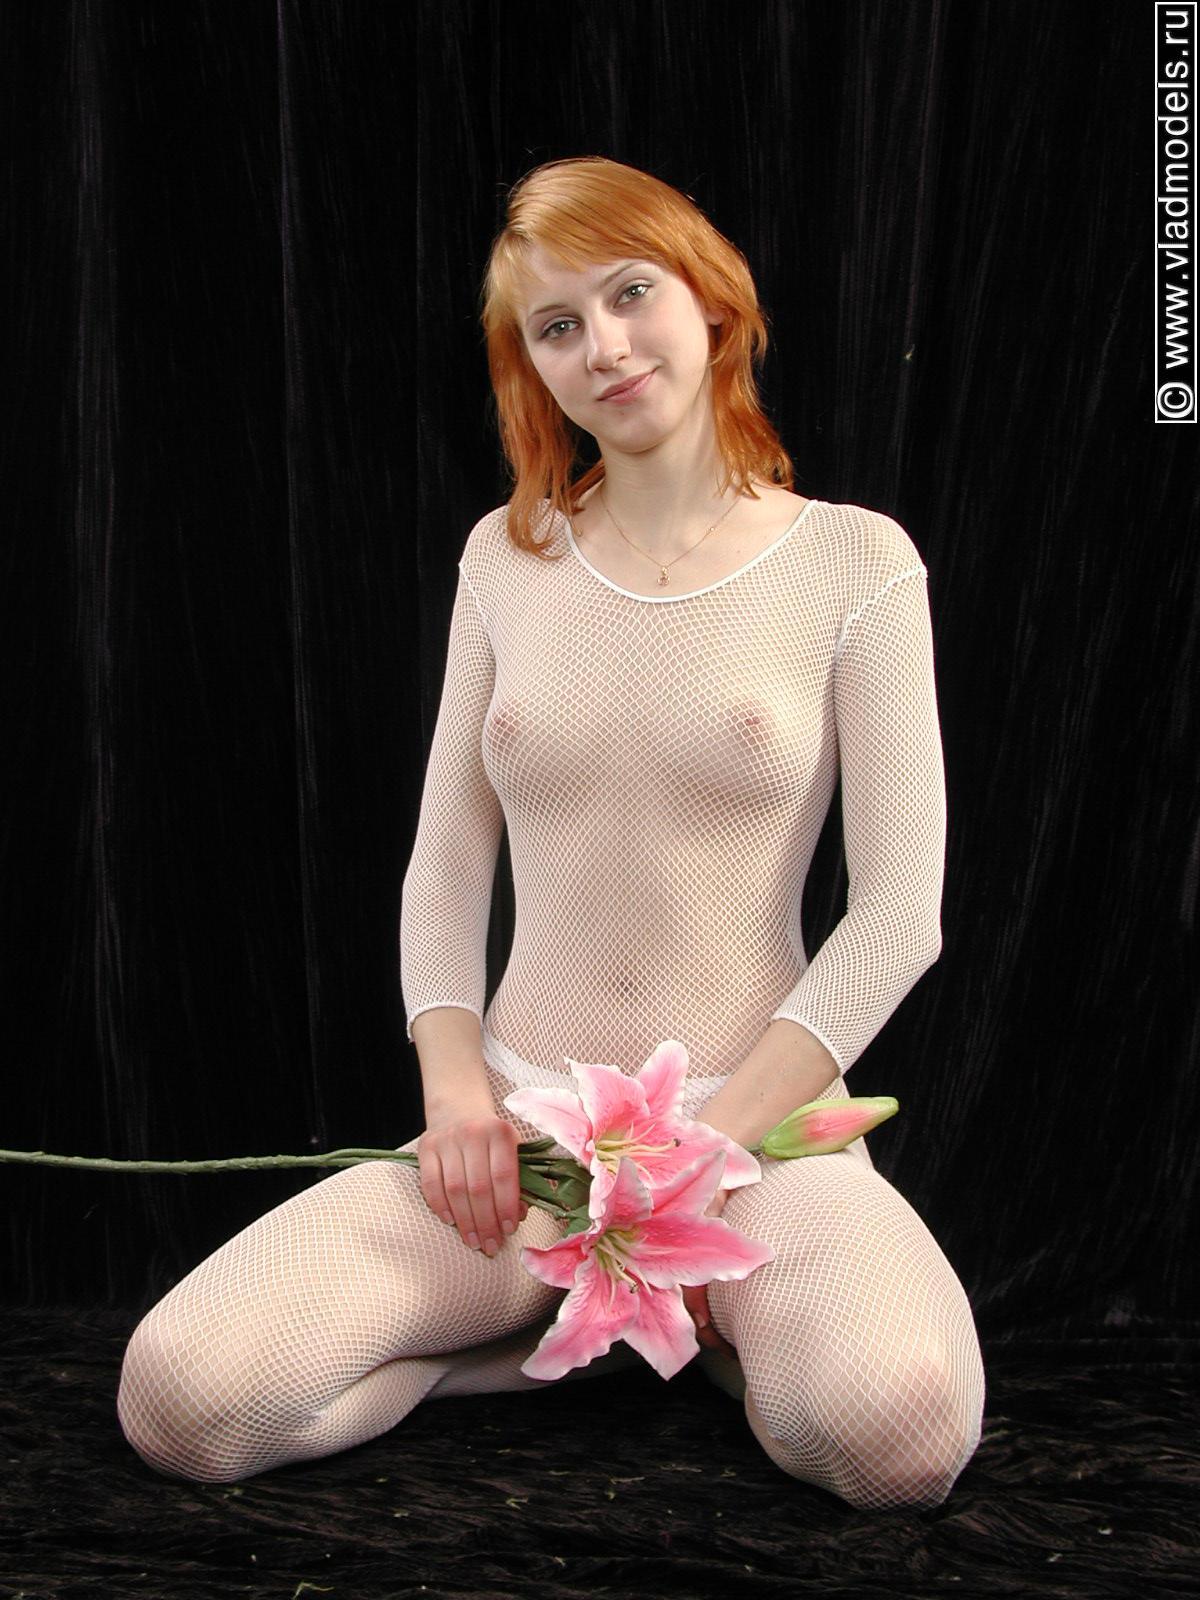 Need girl alisa vlad model pantyhose yes, this